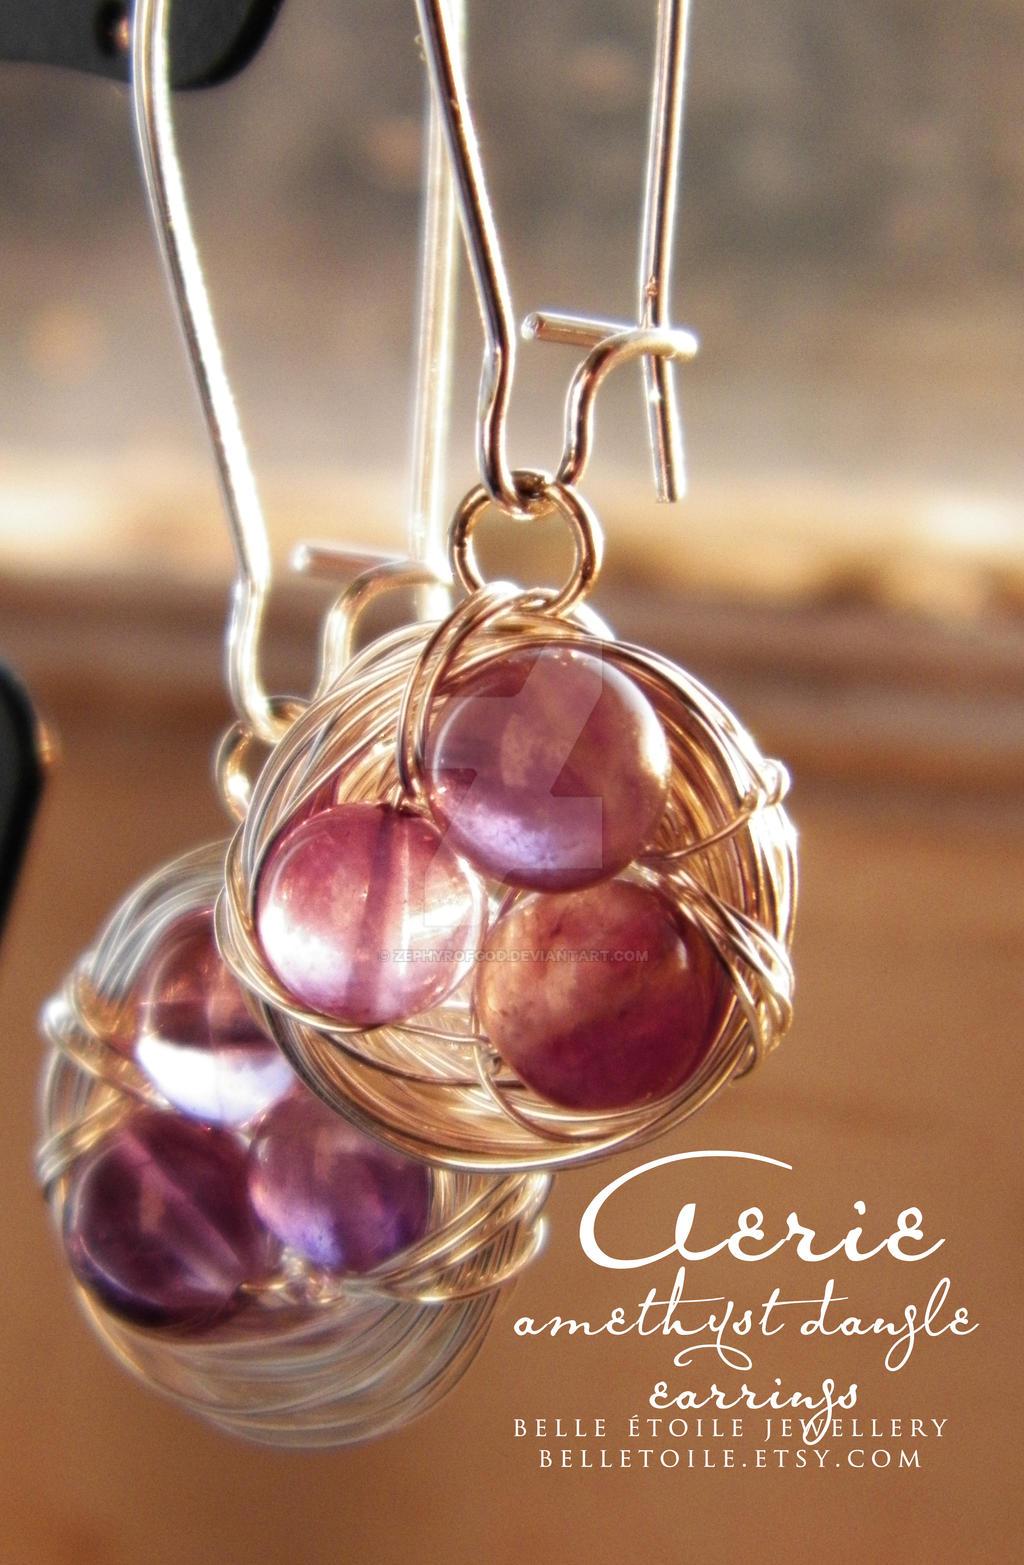 Aerie amethyst dangle earrings by zephyrofgod